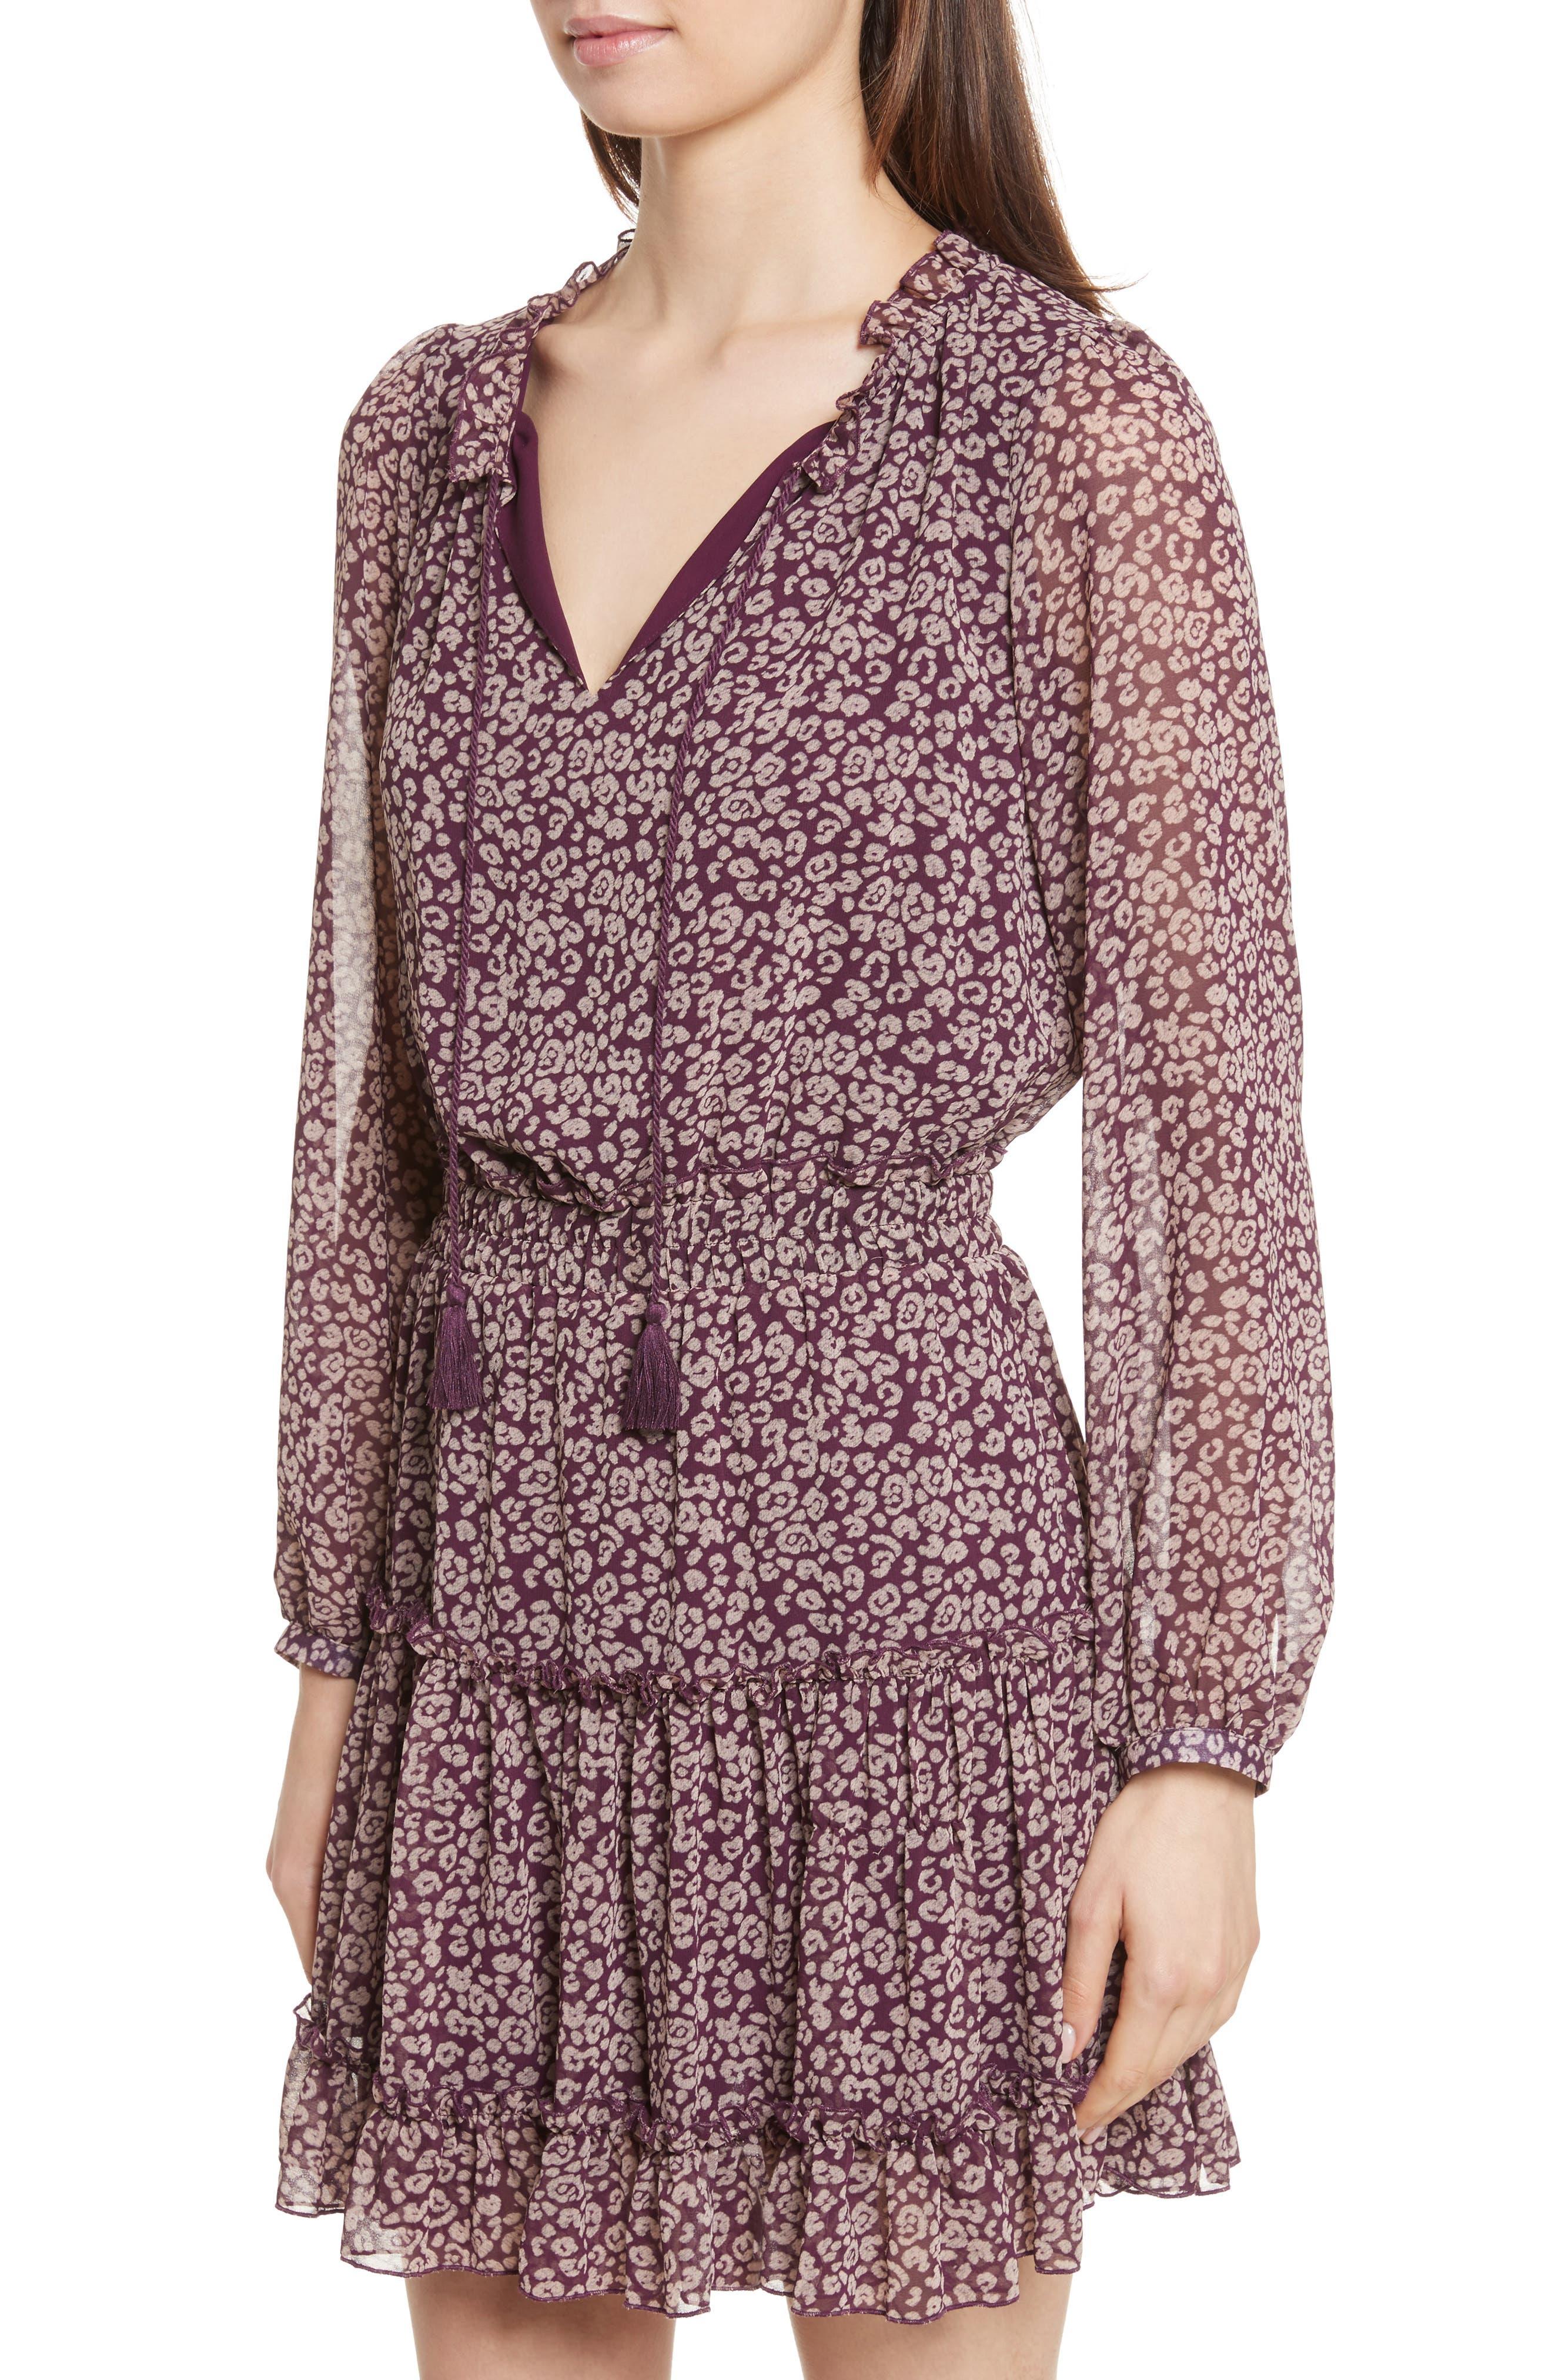 Rosemary A-Line Dress,                             Alternate thumbnail 4, color,                             Potent Purple Leopard